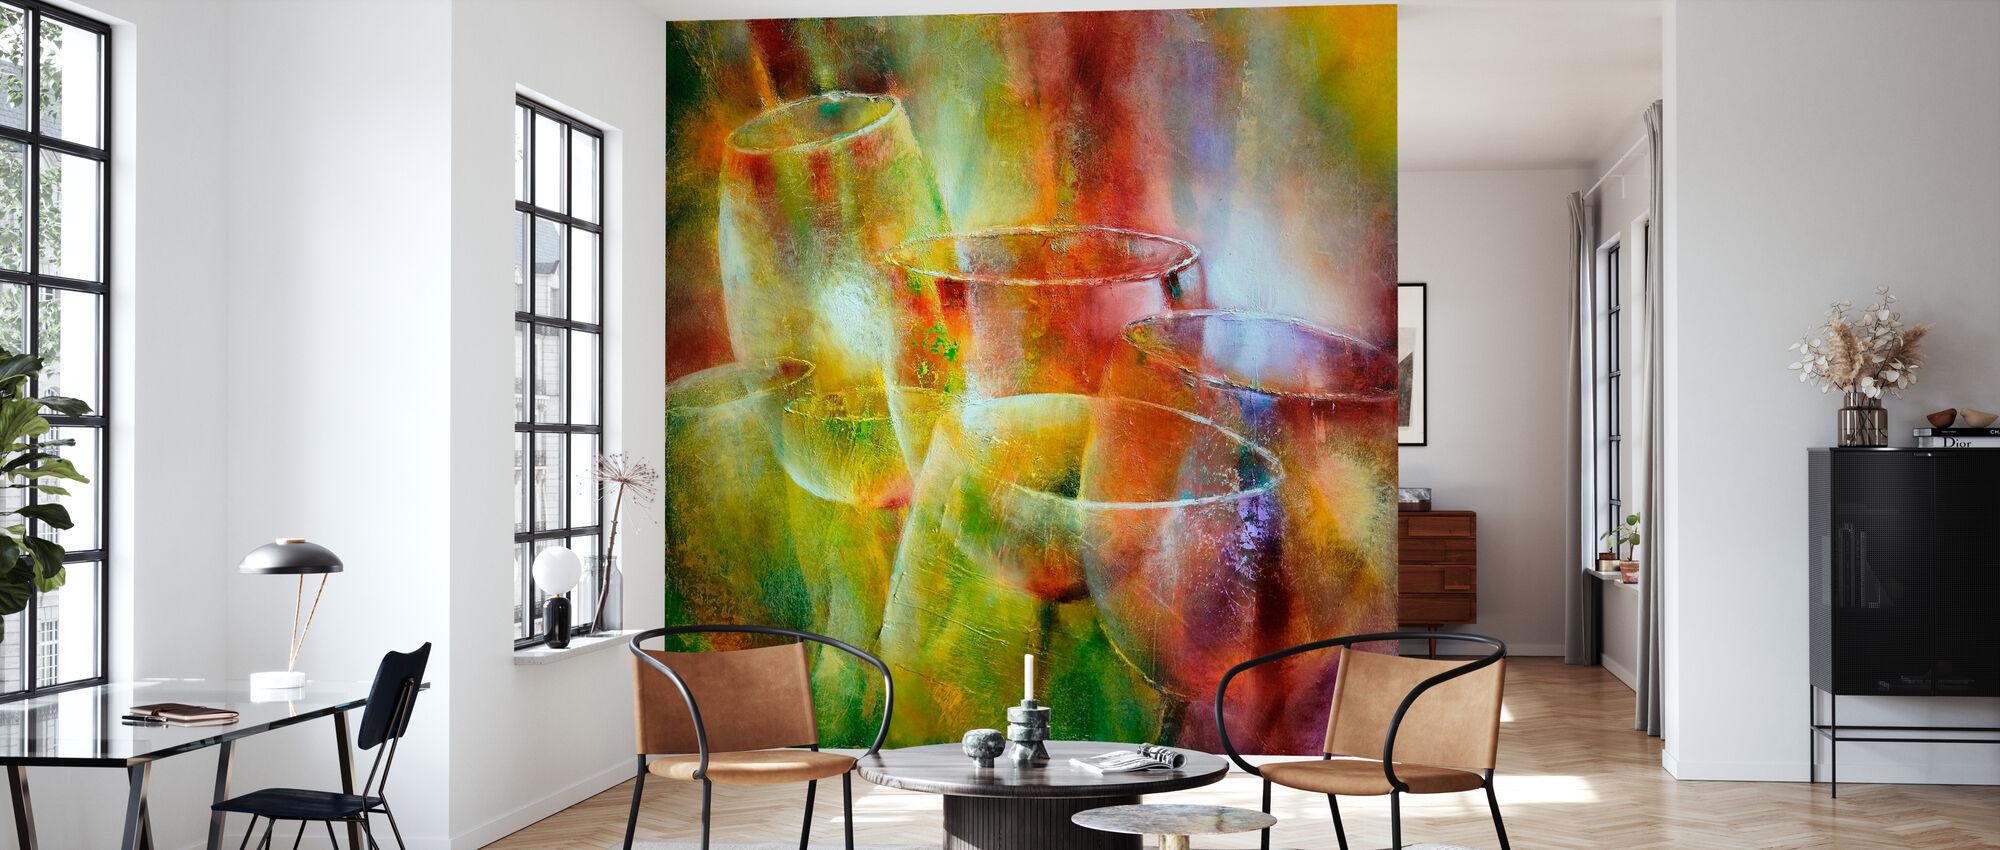 Light Show II - Wallpaper - Living Room